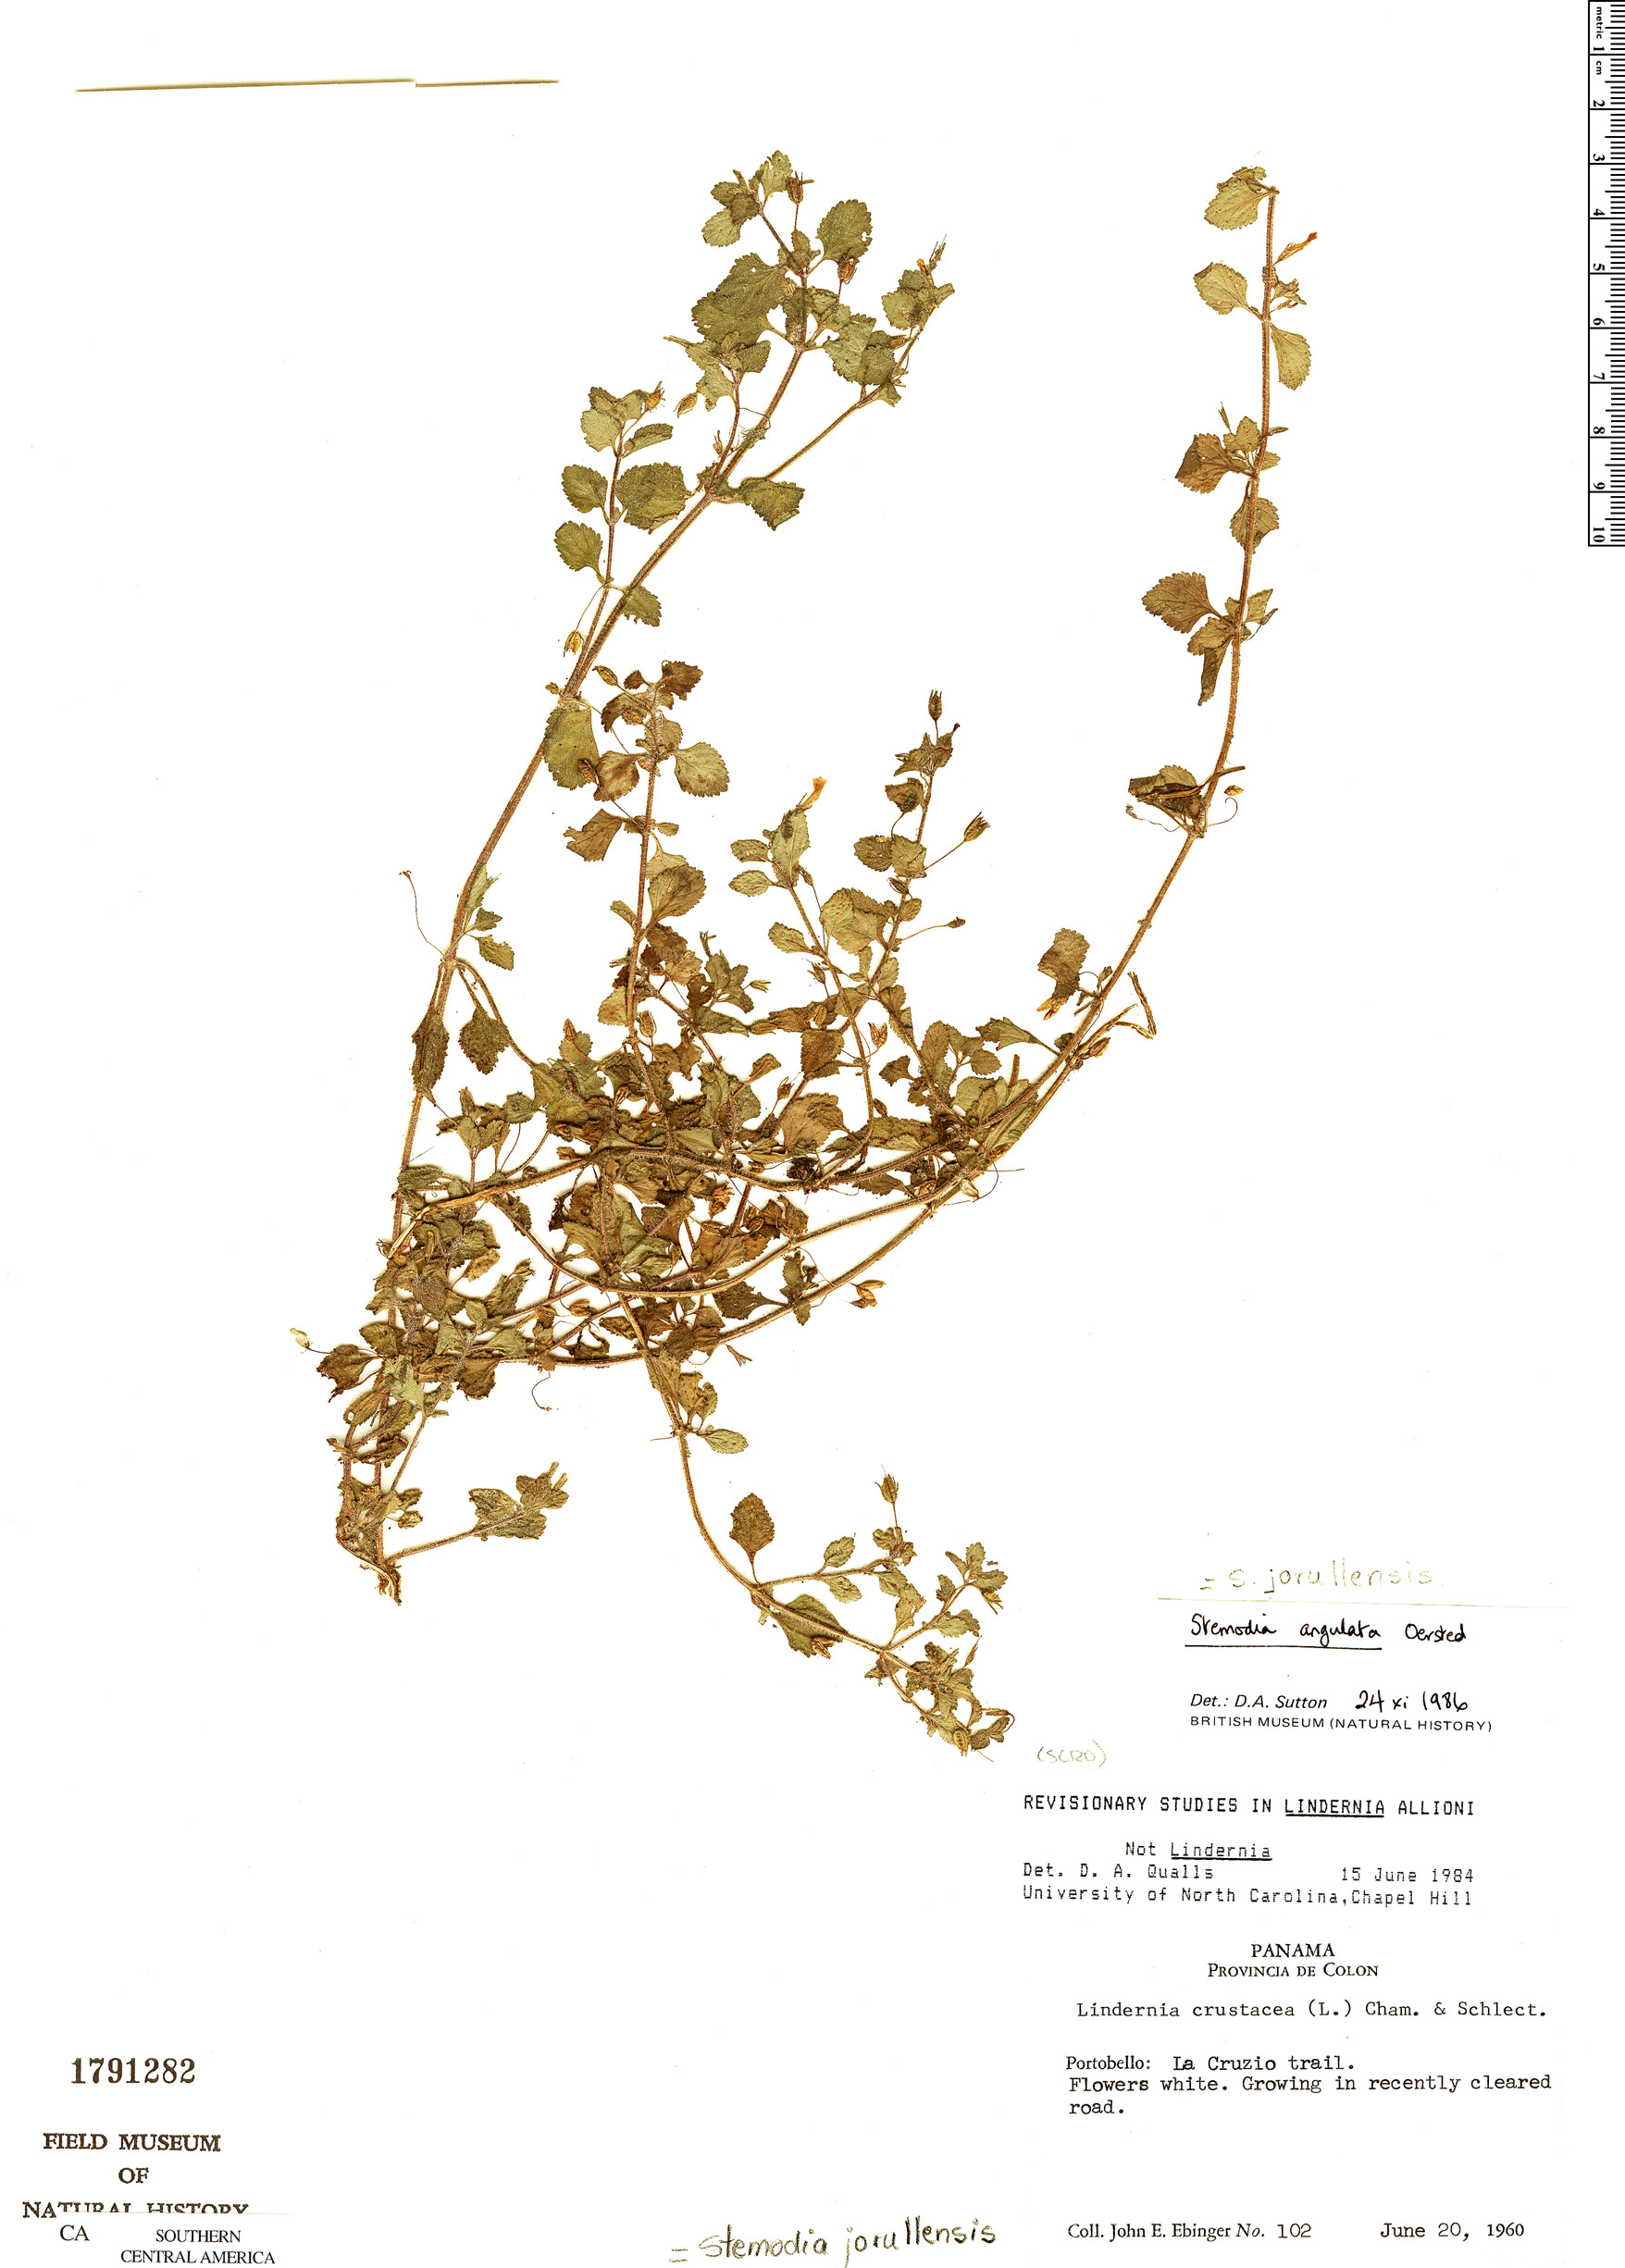 Espécime: Stemodia angulata